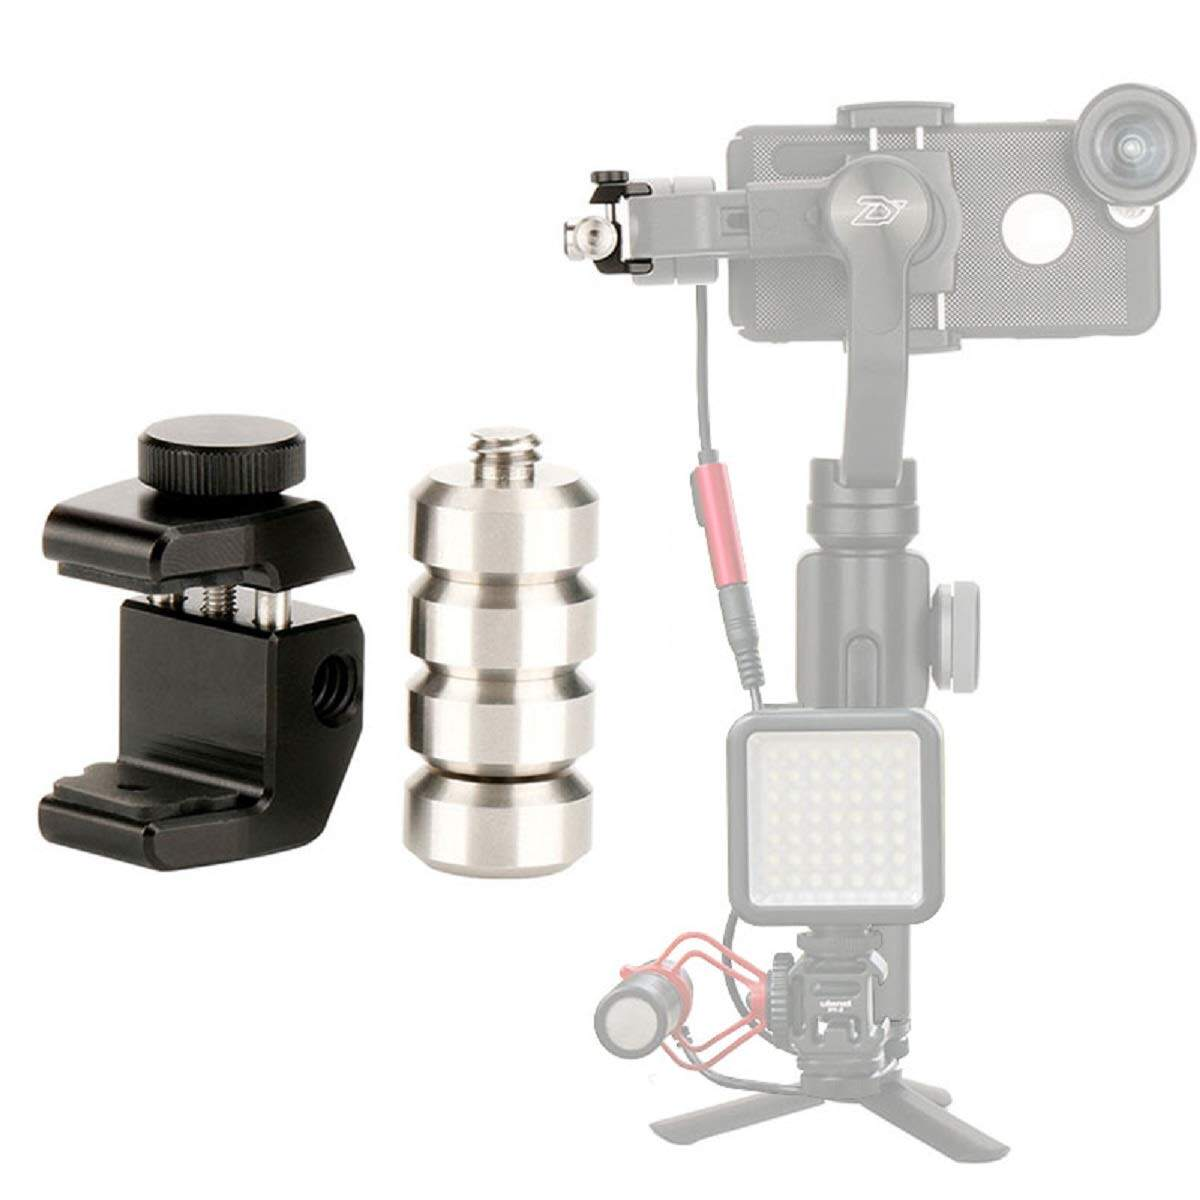 Ulanzi Pt-4 Universal Gimbal Counterweight สำหรับ Dji Osmo มือถือ 2/ชินยุนราบรื่น 4/smooth Q/feiyu Vimble 2/evo /moza Mini Mi Stabilizer อื่นๆ 3 - ขาตั้งยึดสำหรับกันสั่นสำหรับ Balancing Moment Anamorphic Lens, 60g Counter น้ำหนัก.